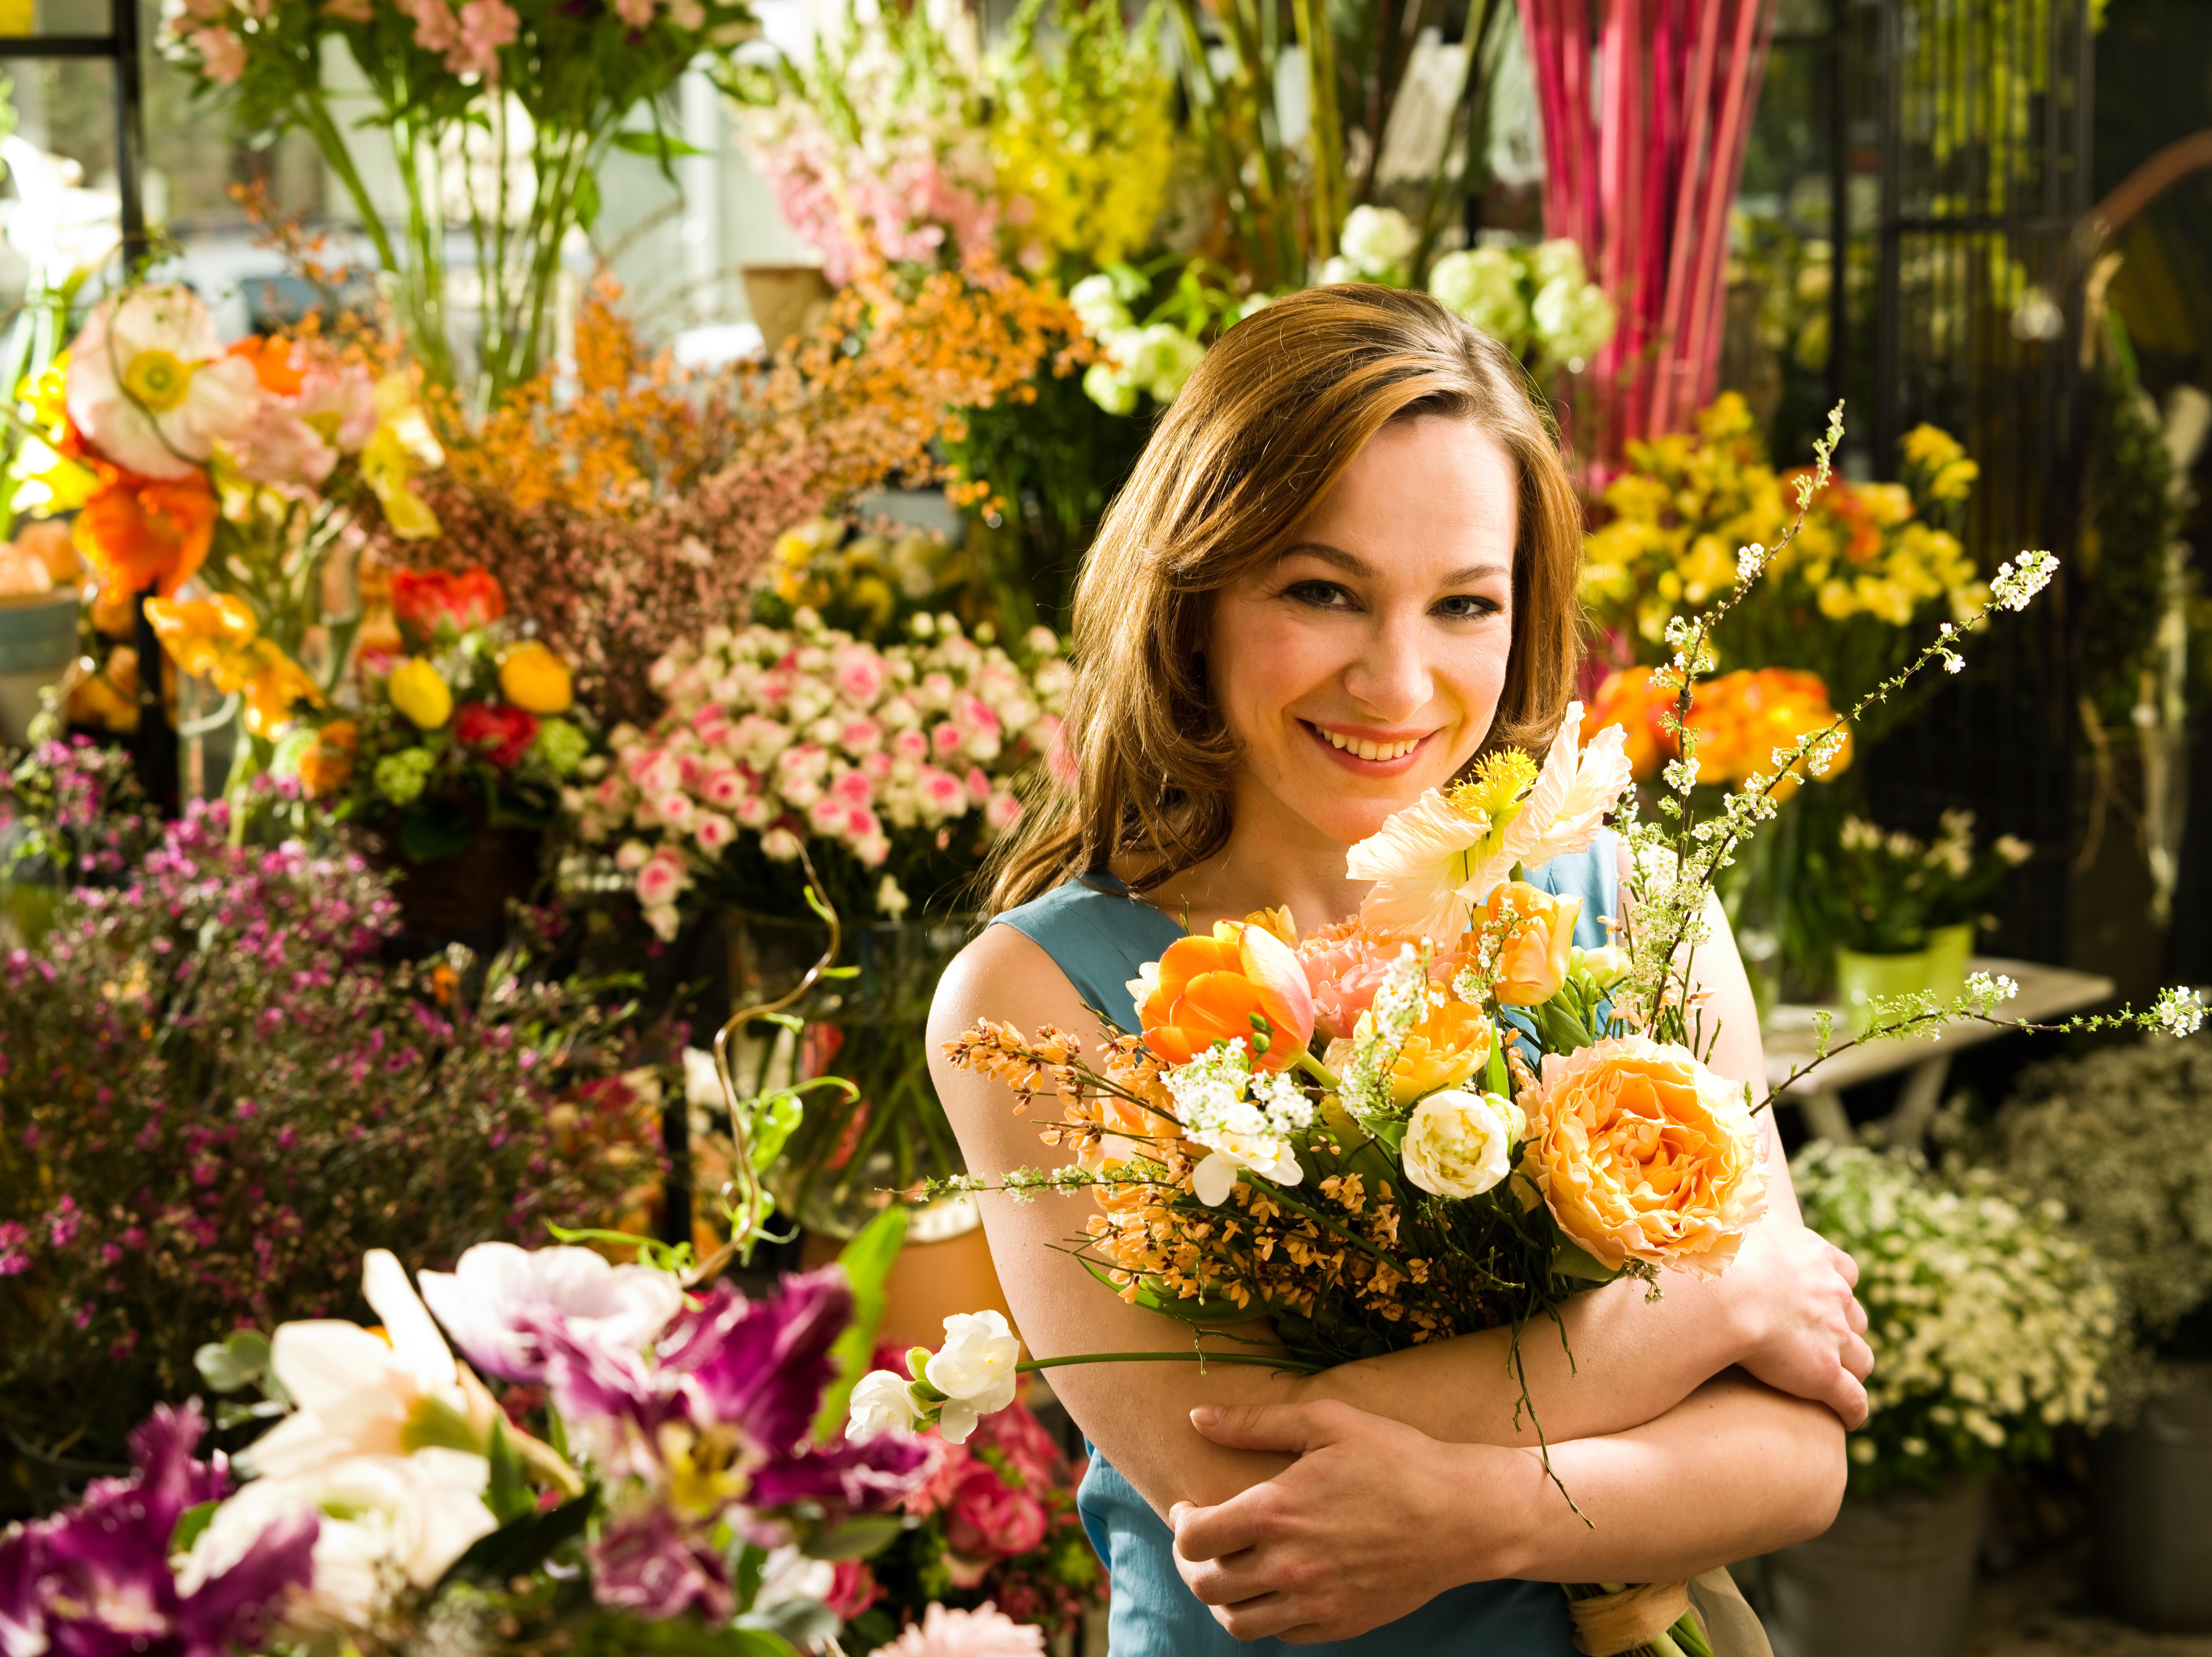 Dunkelhaarige Frau mit Blumen